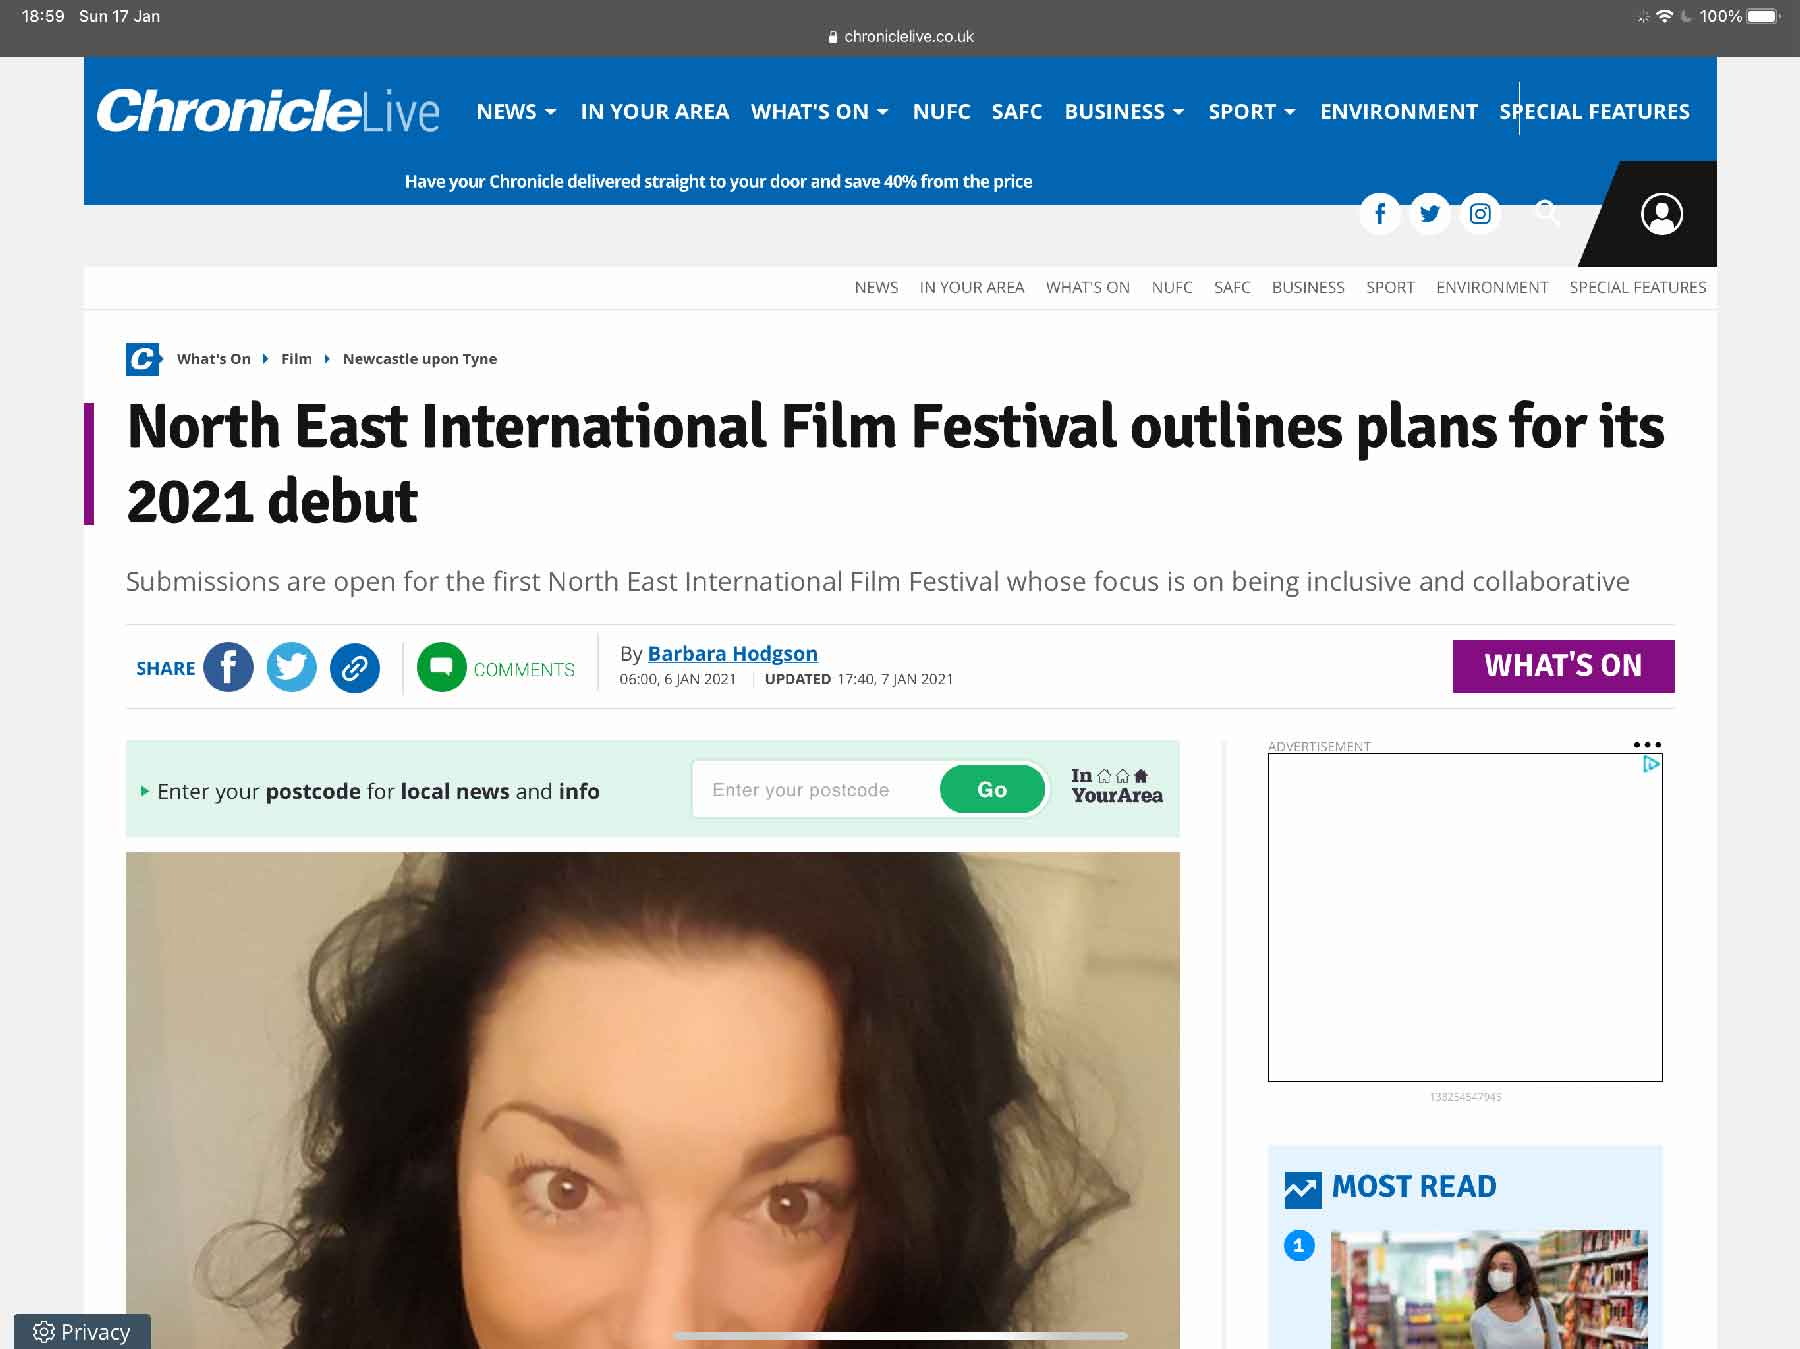 North East International Film Festival outlines plans for its 2021 debut